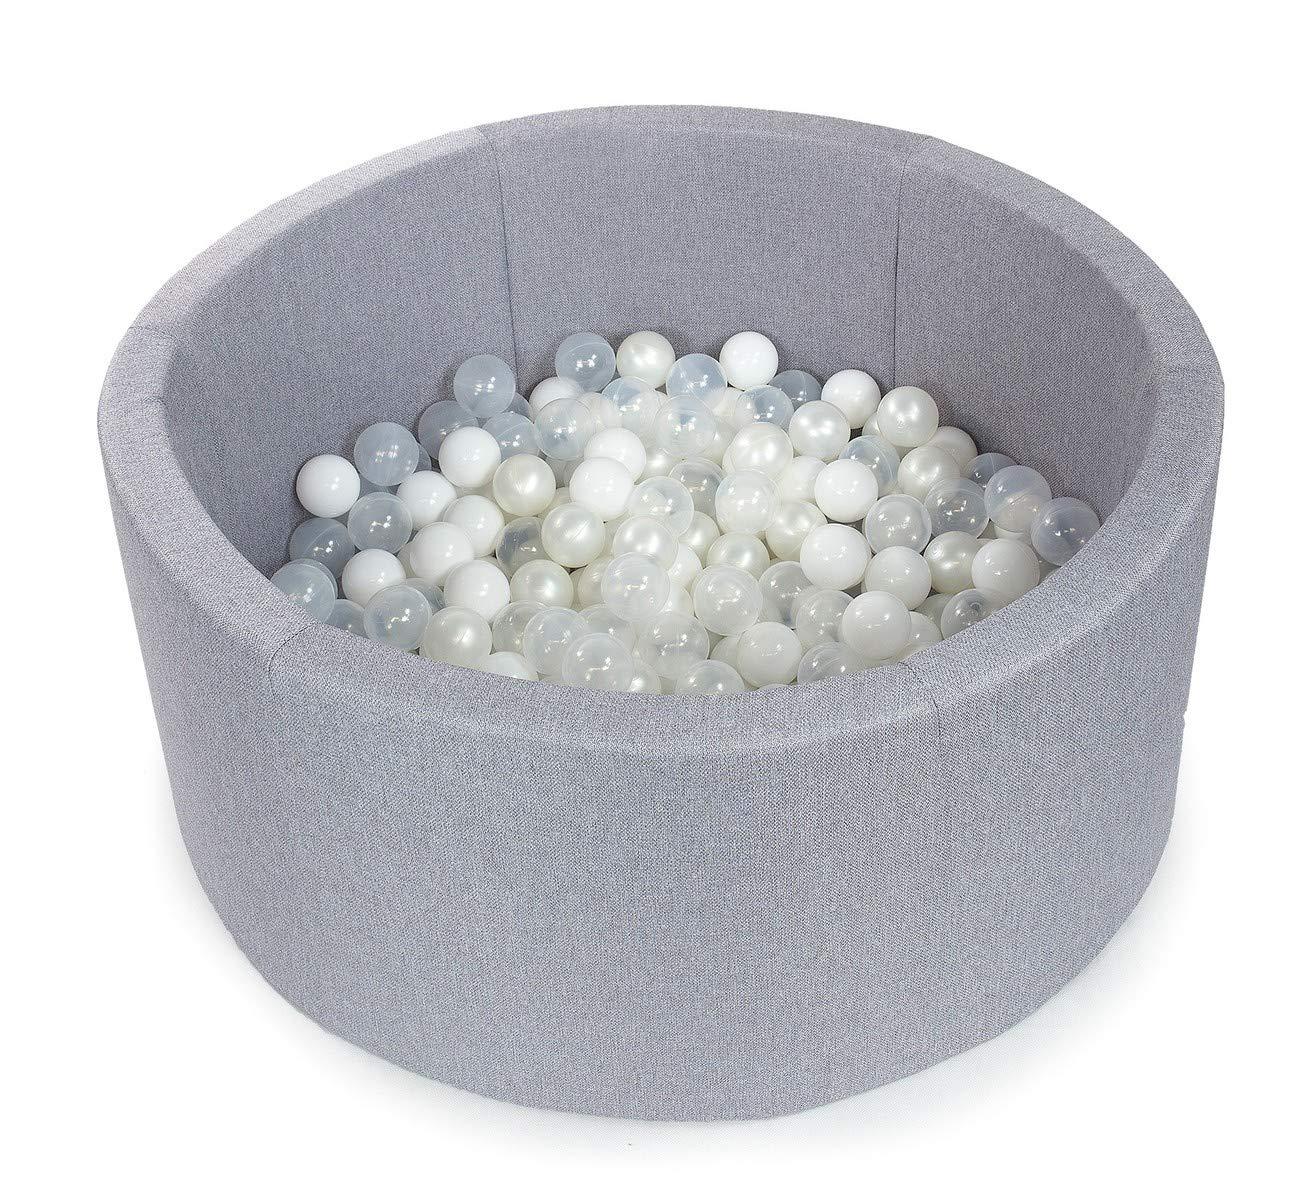 Tweepsy Soft Baby Round Ball Pool Pit 250 Balls 90x40cm Handmade EU - BKOZ1N - Light Grey Pool: Transparent, White, Pearl